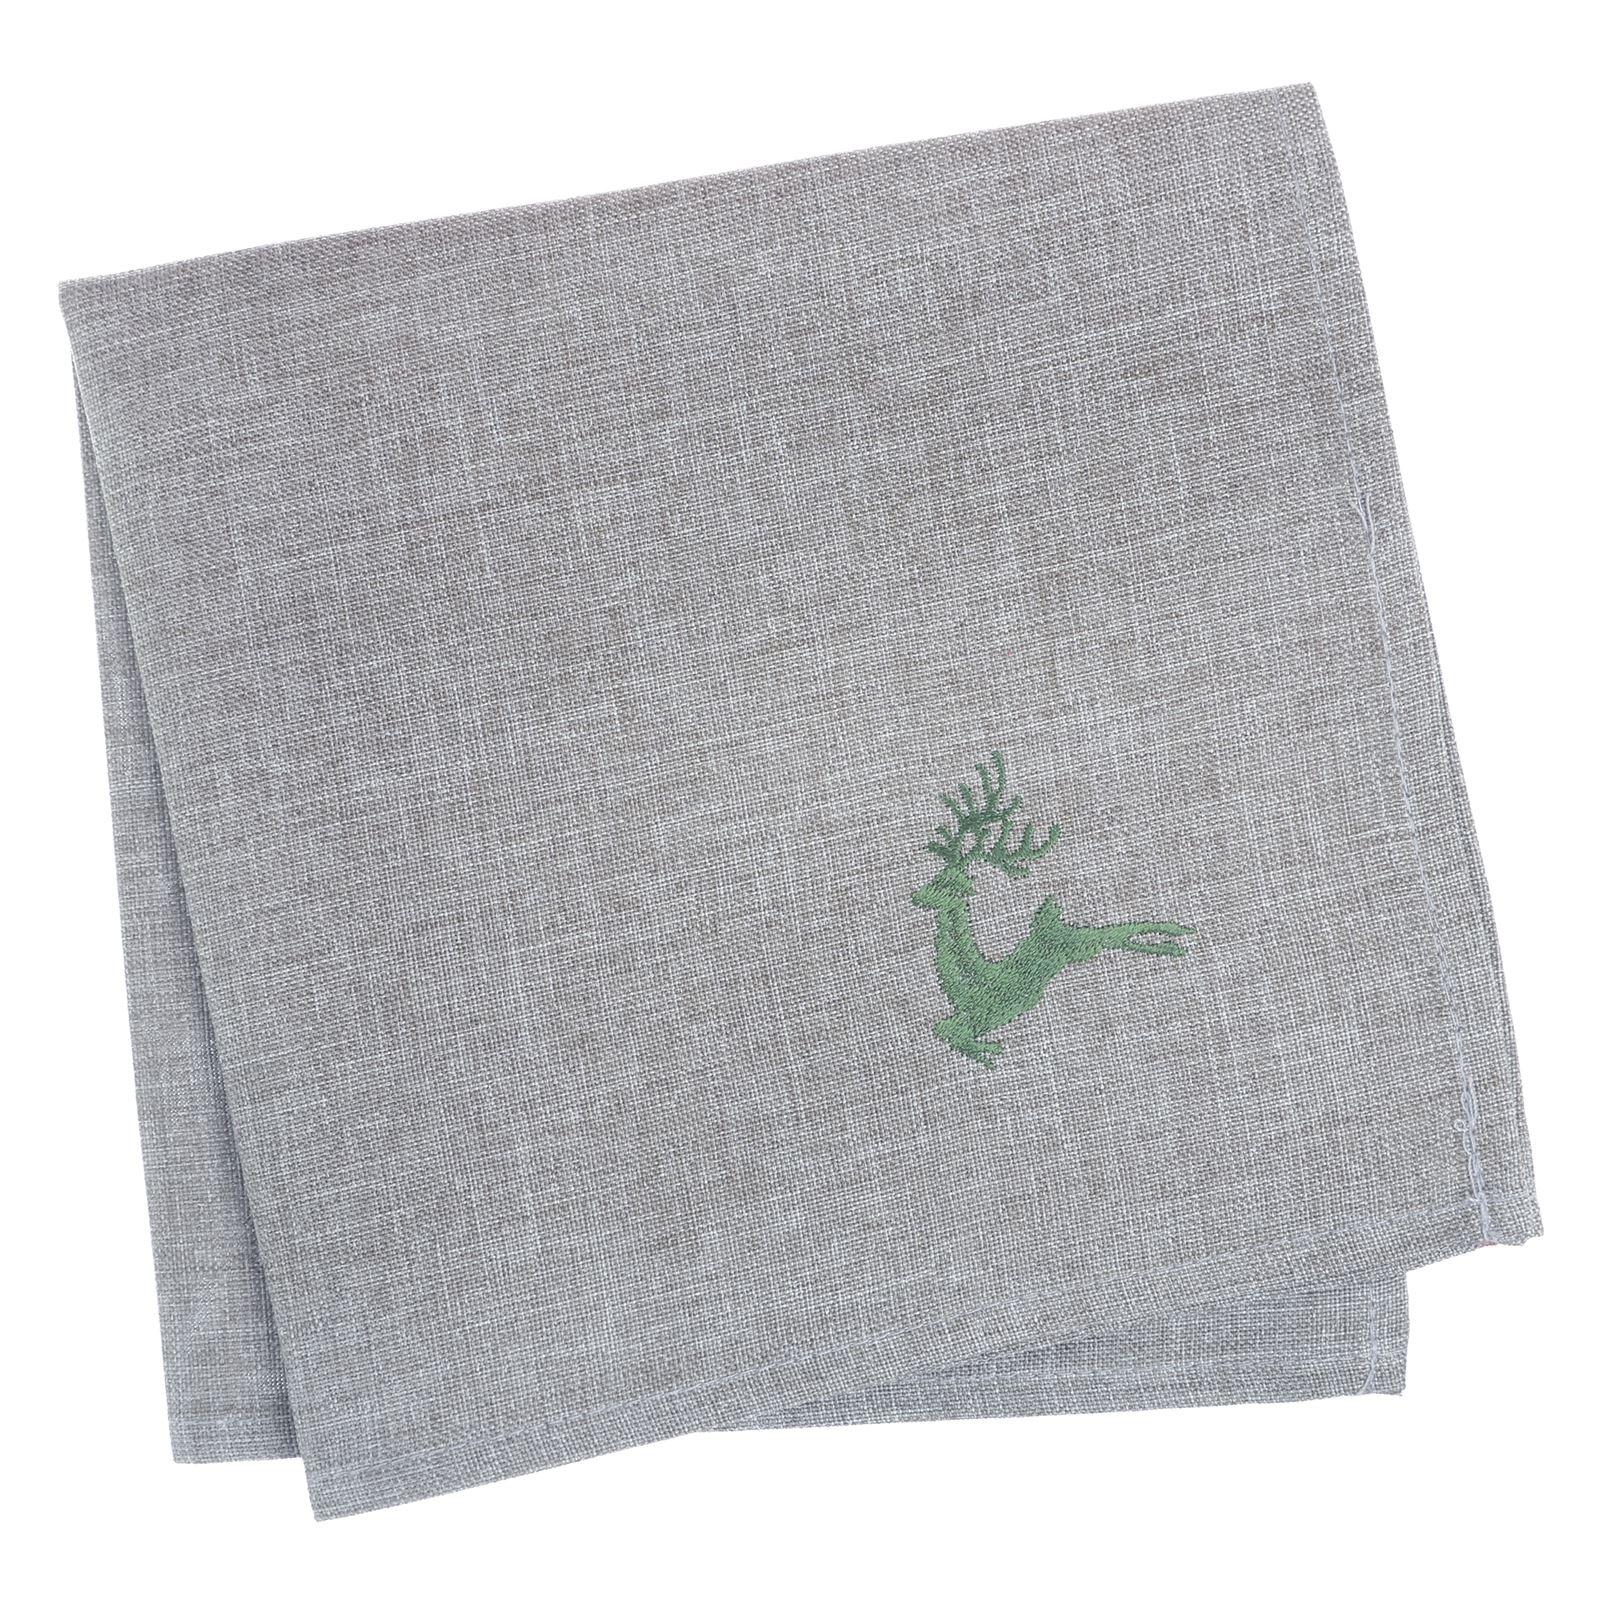 Christmas-Tablecloth-Festive-Pattern-Rectangle-Round-Fabric-Xmas-Room-Decoration Indexbild 115